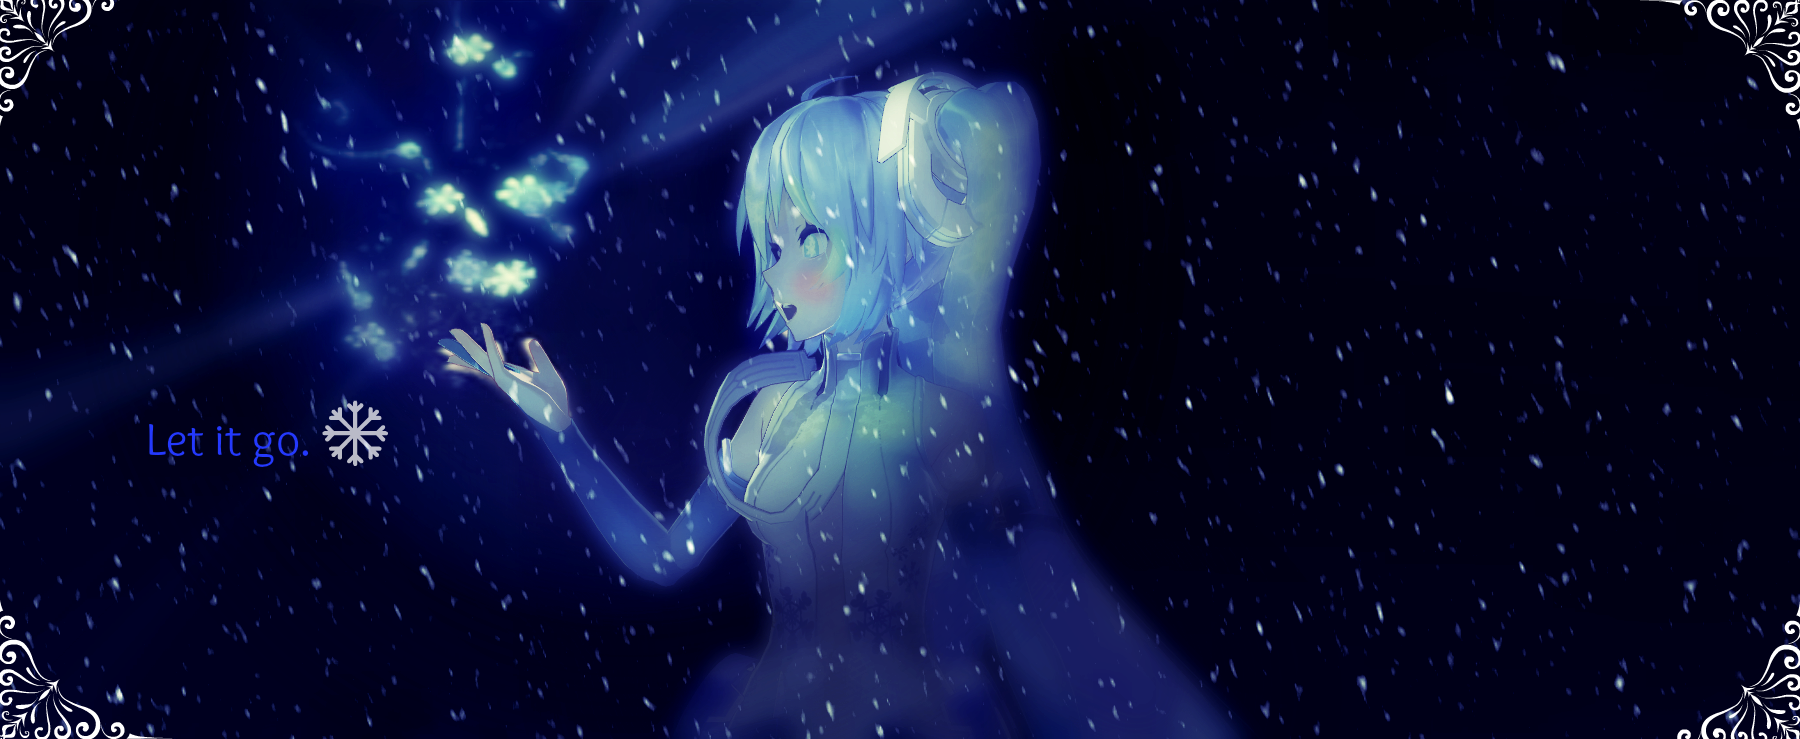 let it go.- frozen disney mmdruinana-chan on deviantart